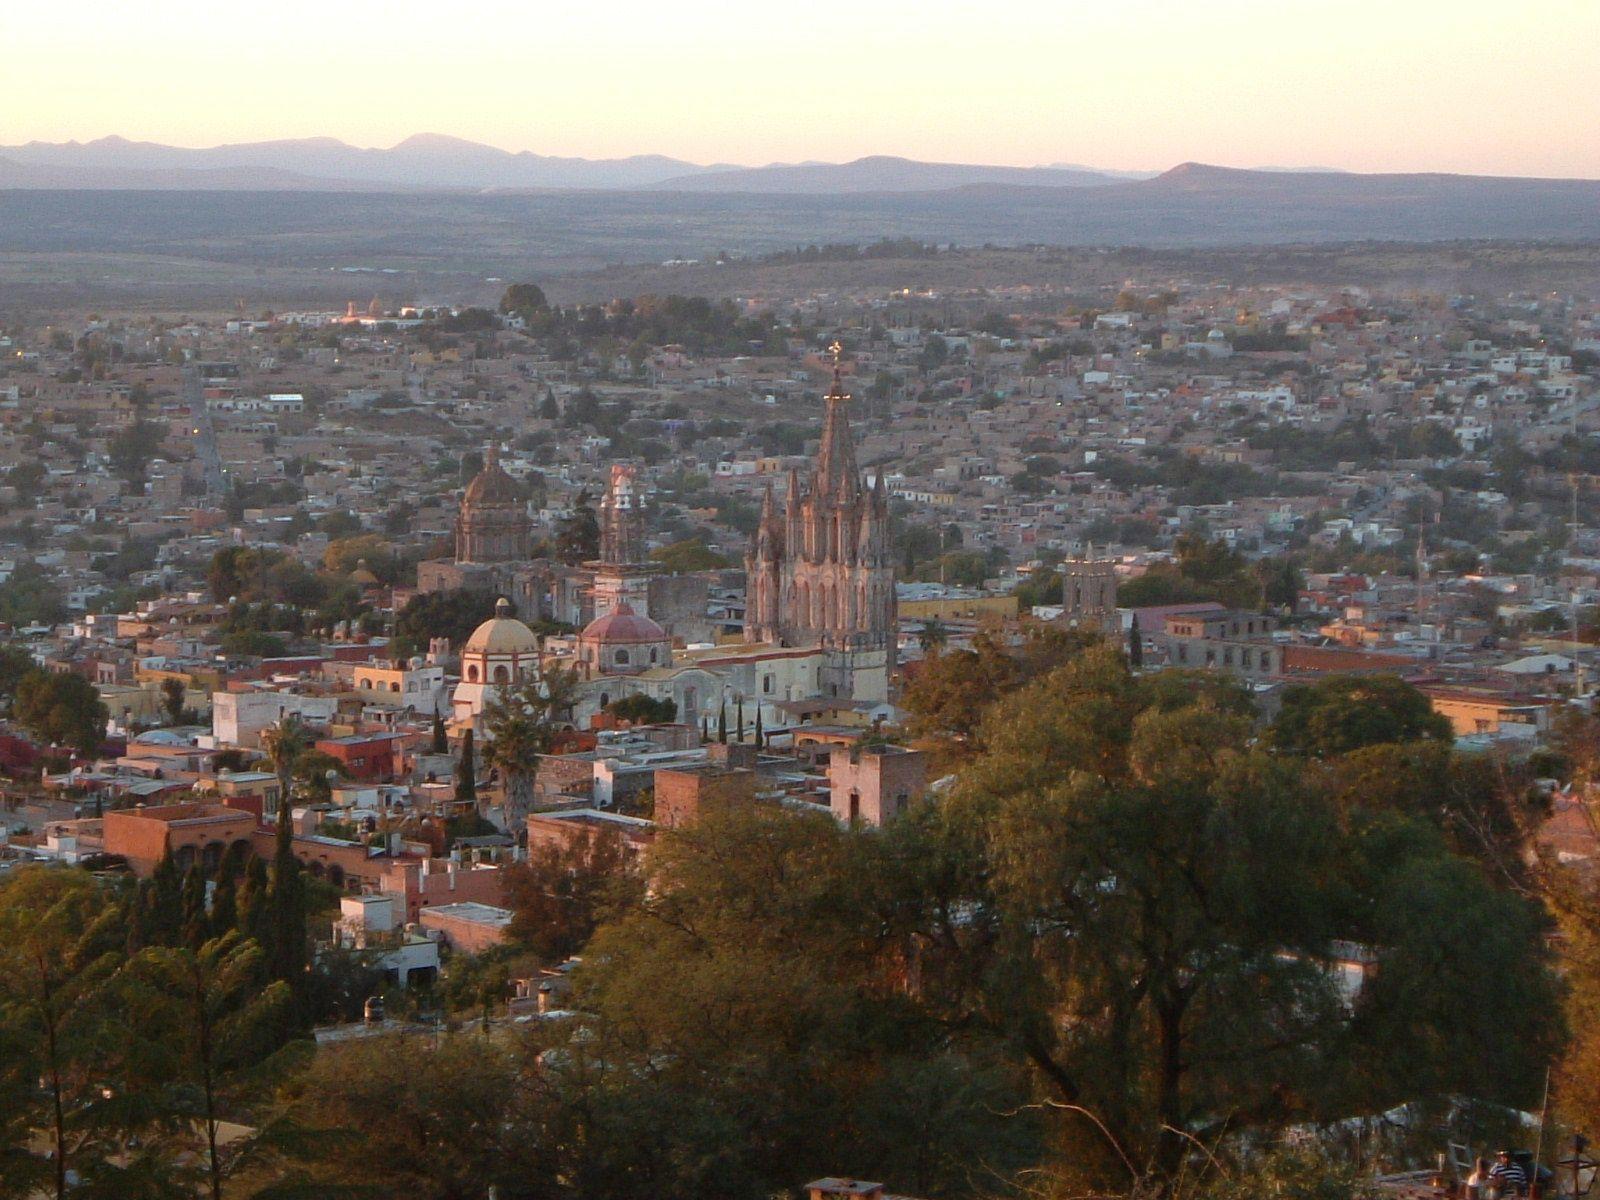 Vista panorâmica de São Miguel de Allende, estado de Guanajuato, México. Fotografia: Ruiz.